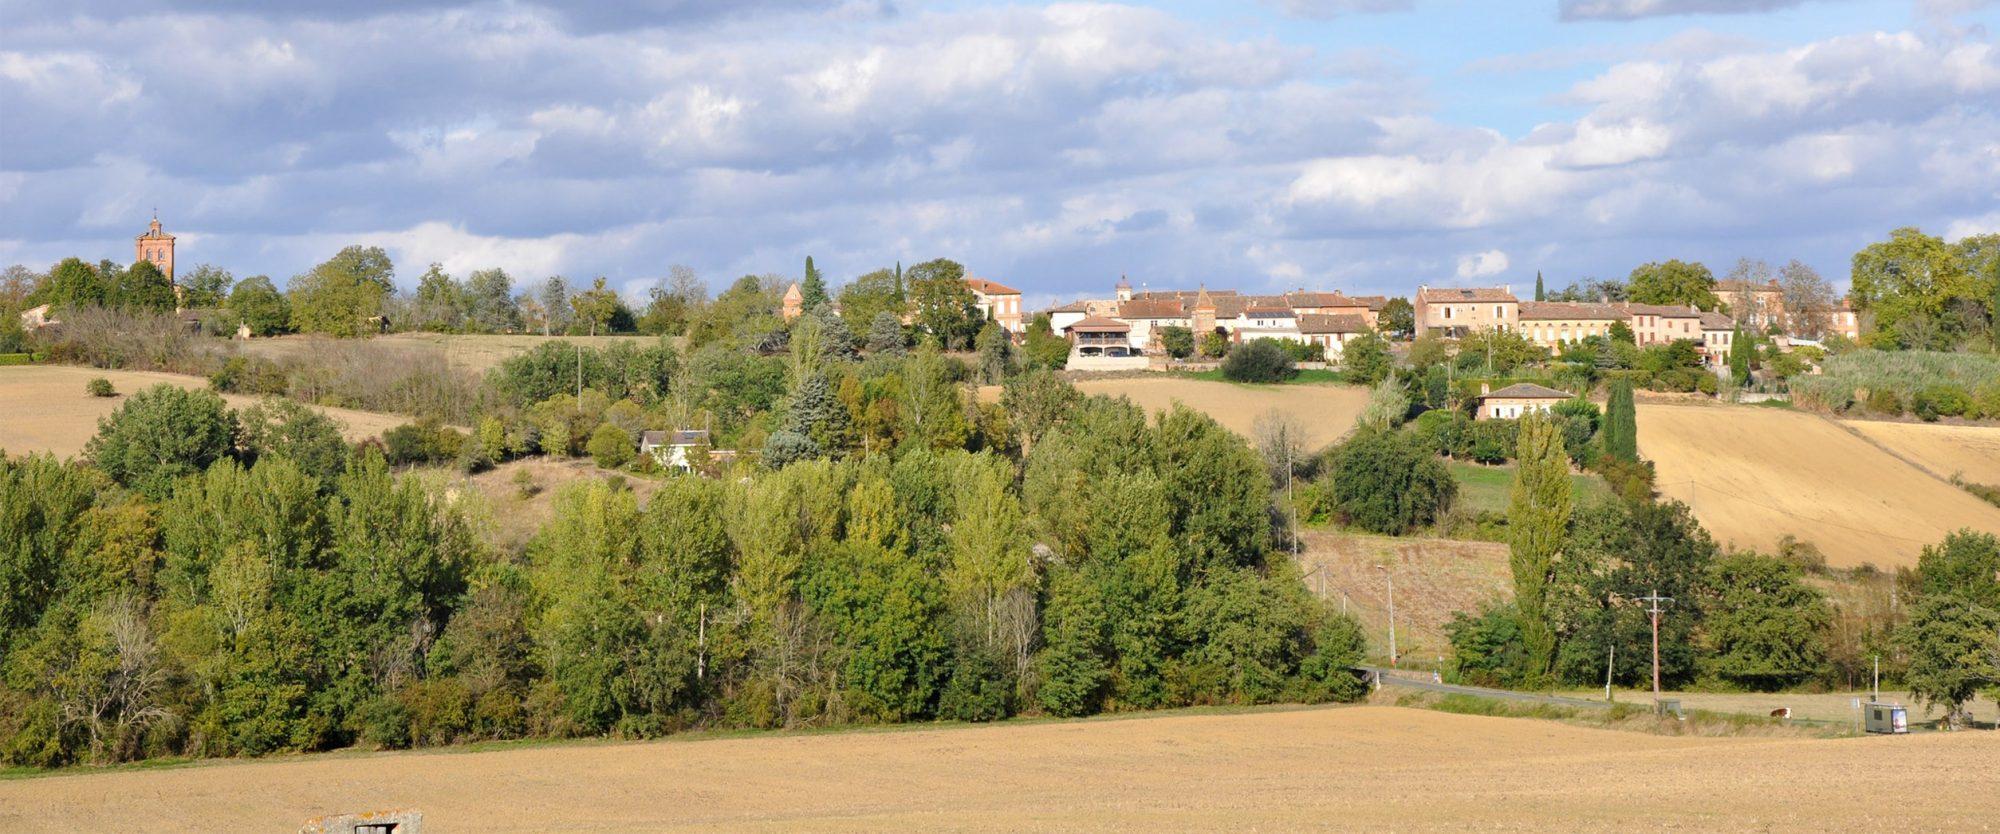 AZAS, commune rurale en Haute-Garonne